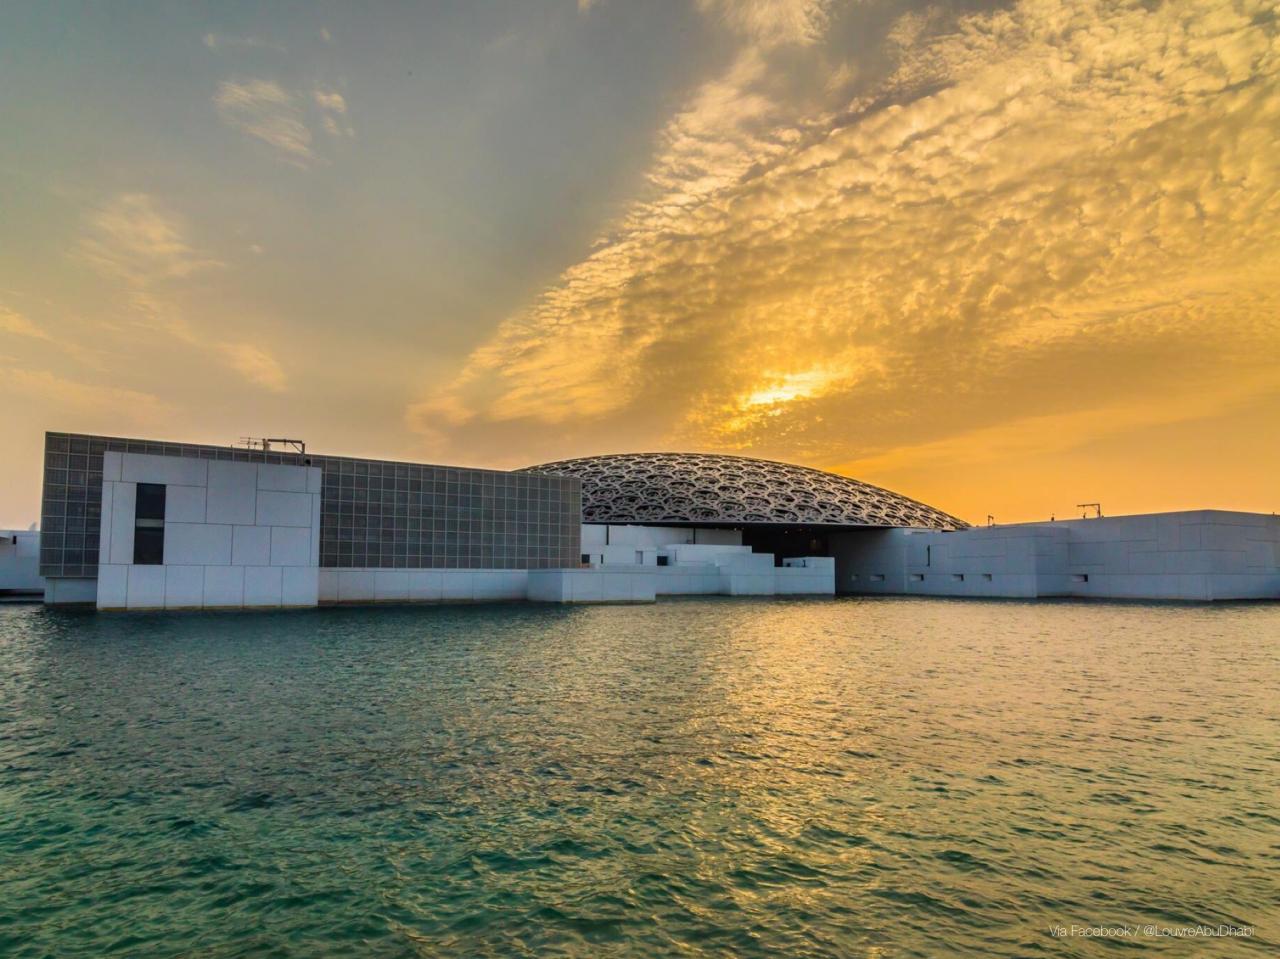 Louvre-Abu-Dhabi-Museum-Sunset